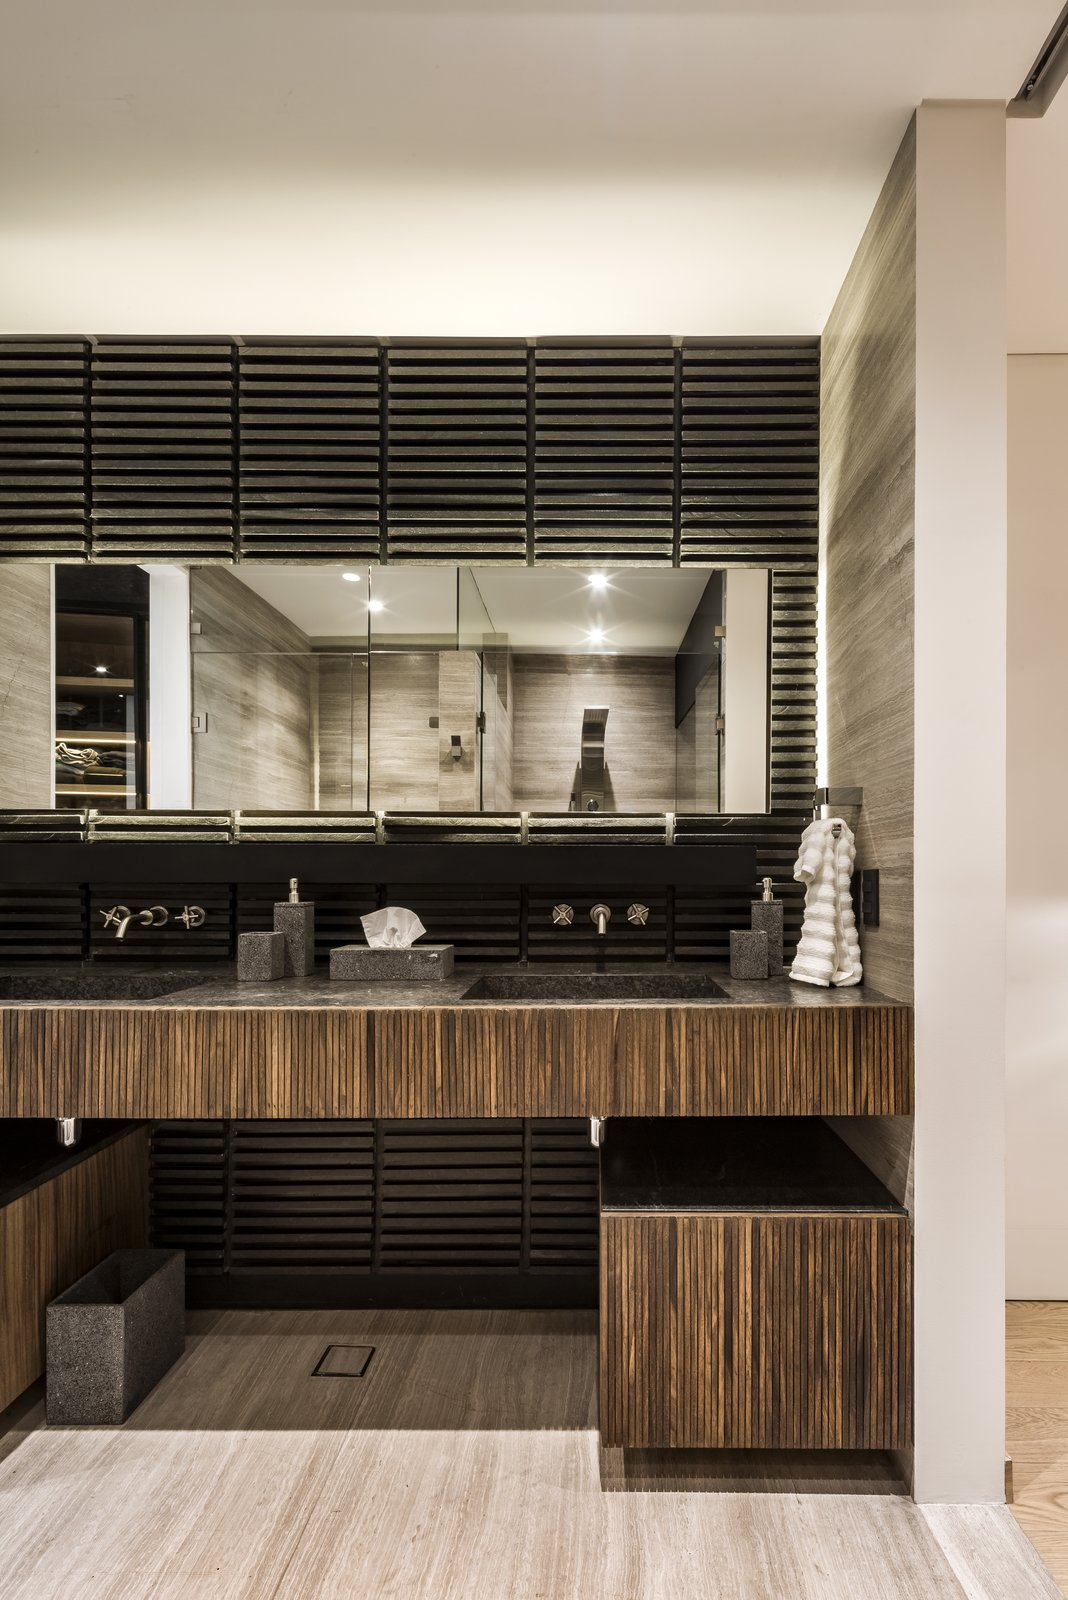 Bath, Light Hardwood, Wood, Drop In, and Wall Main bathroom  Best Bath Light Hardwood Wood Photos from Apartment in Ahuehuetes Norte